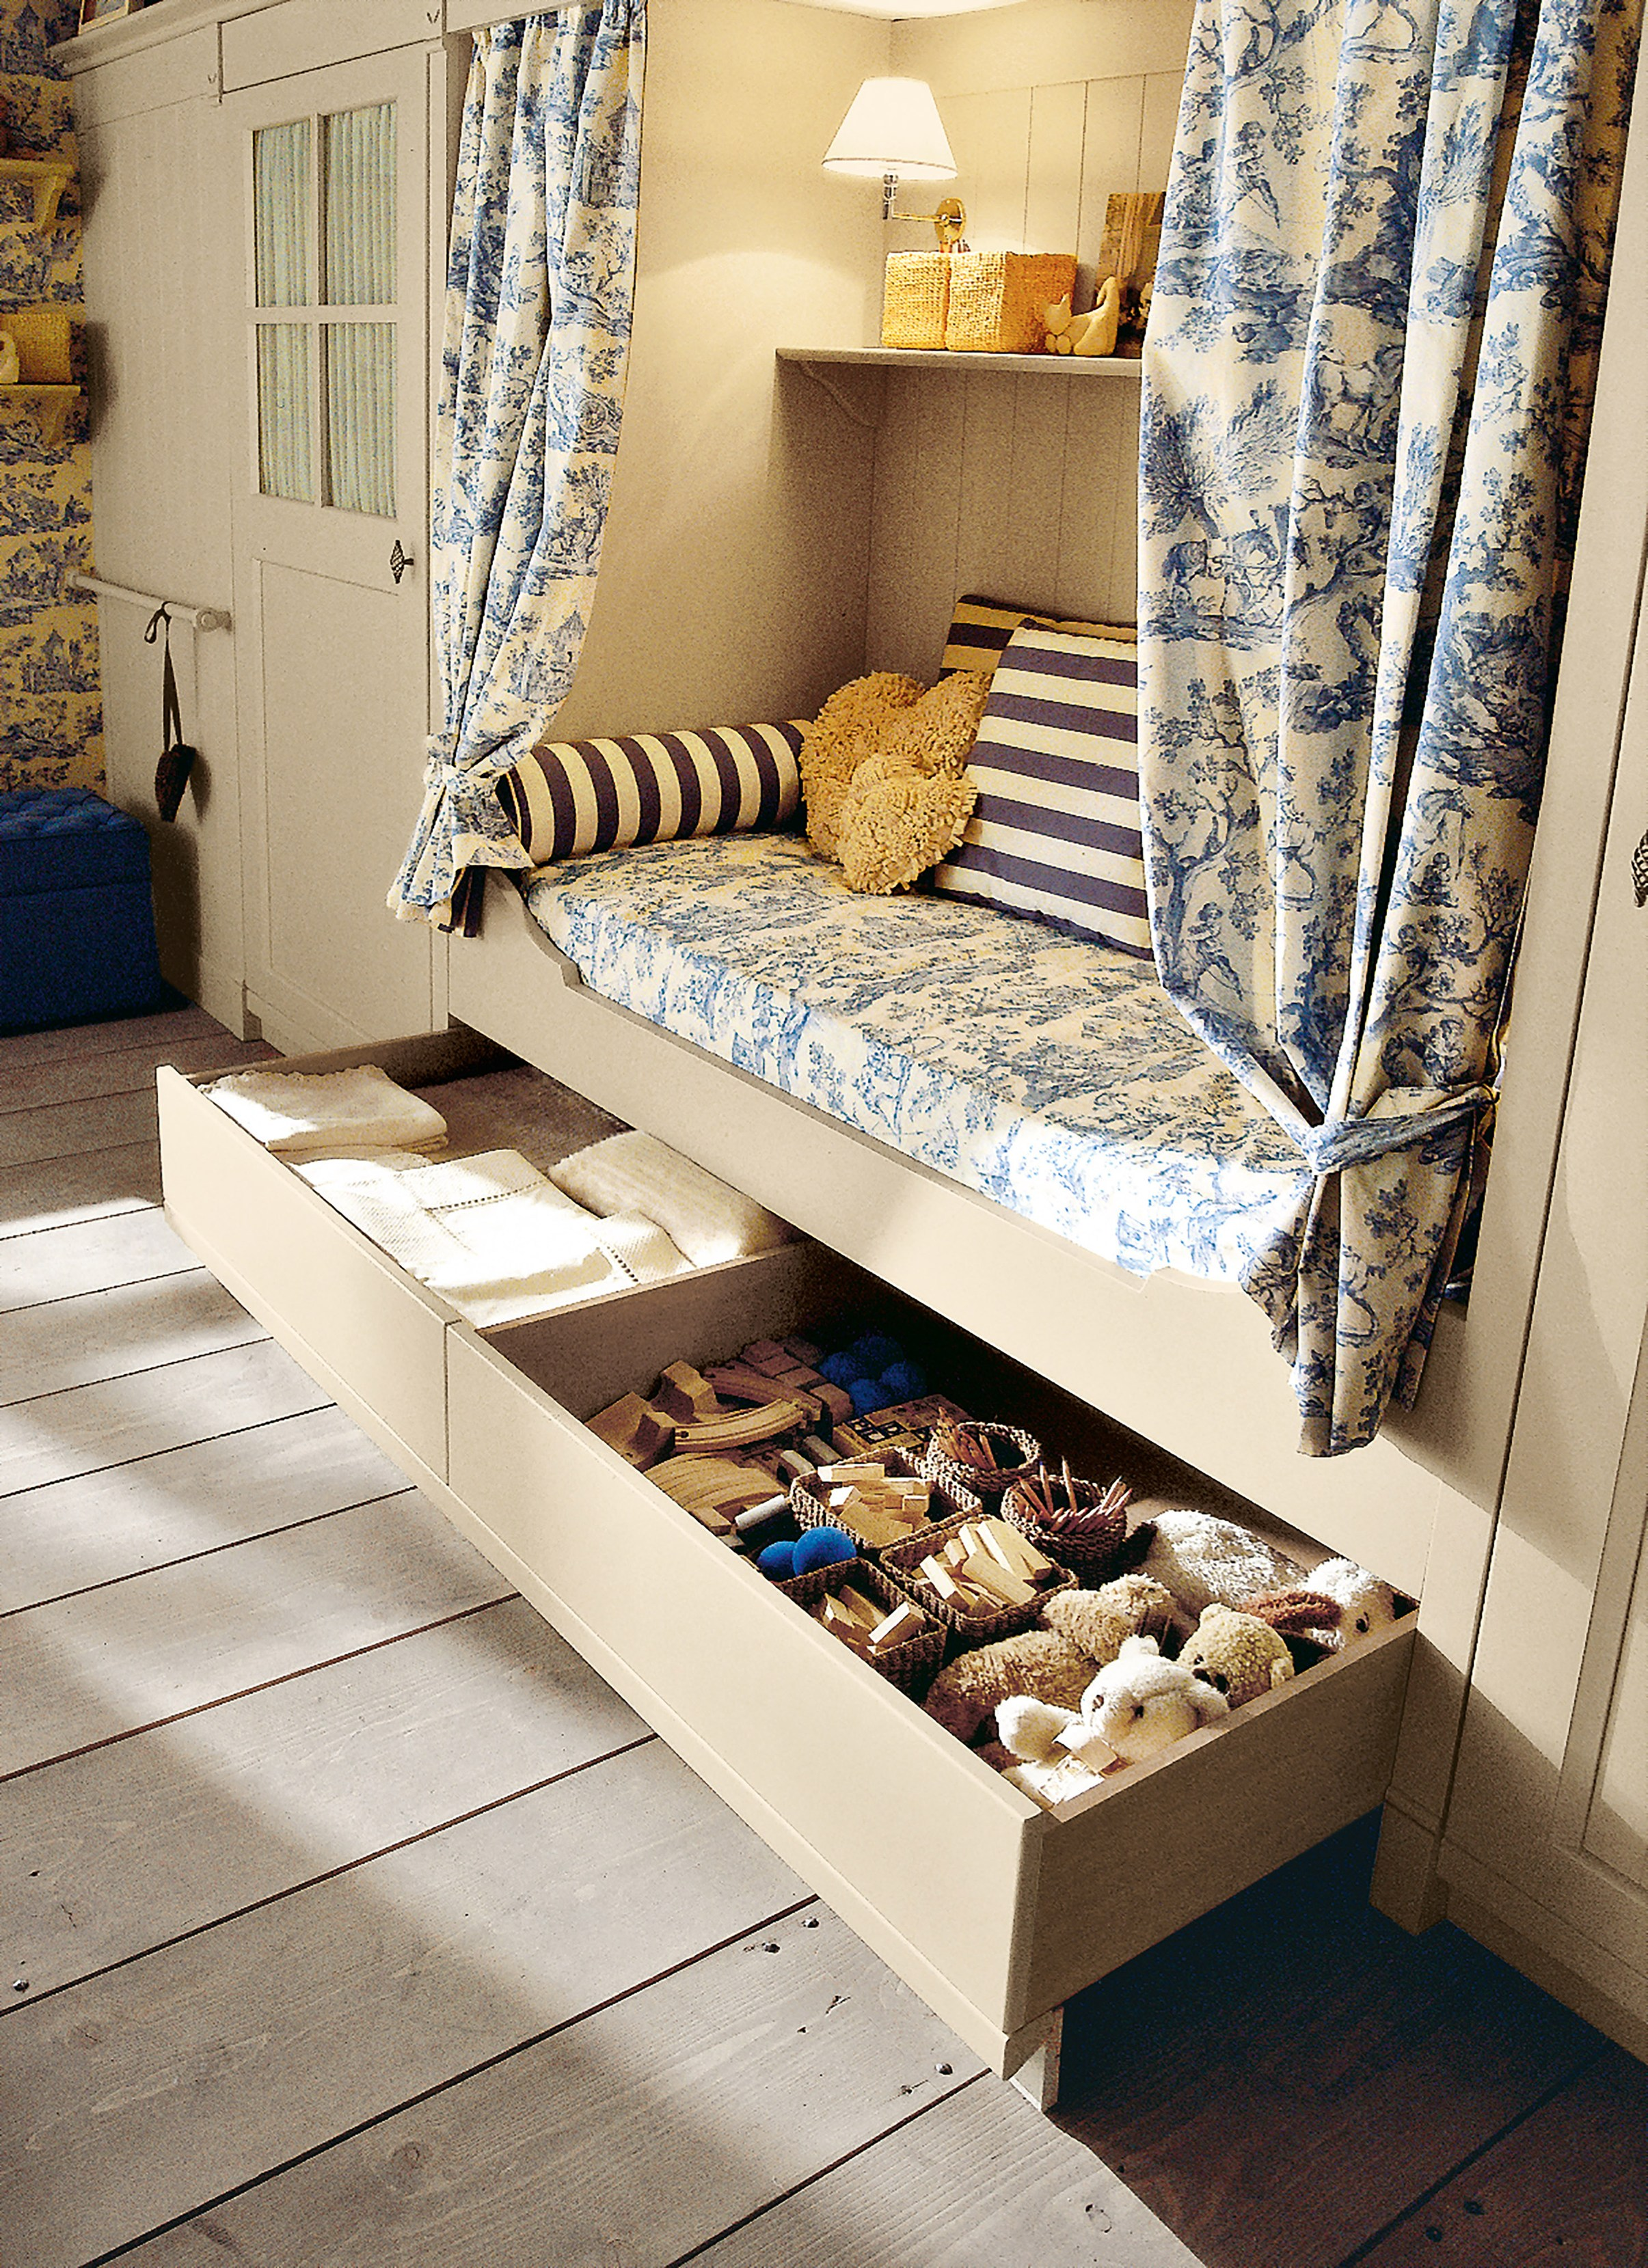 English style bedrooms - English Style Bedrooms 33